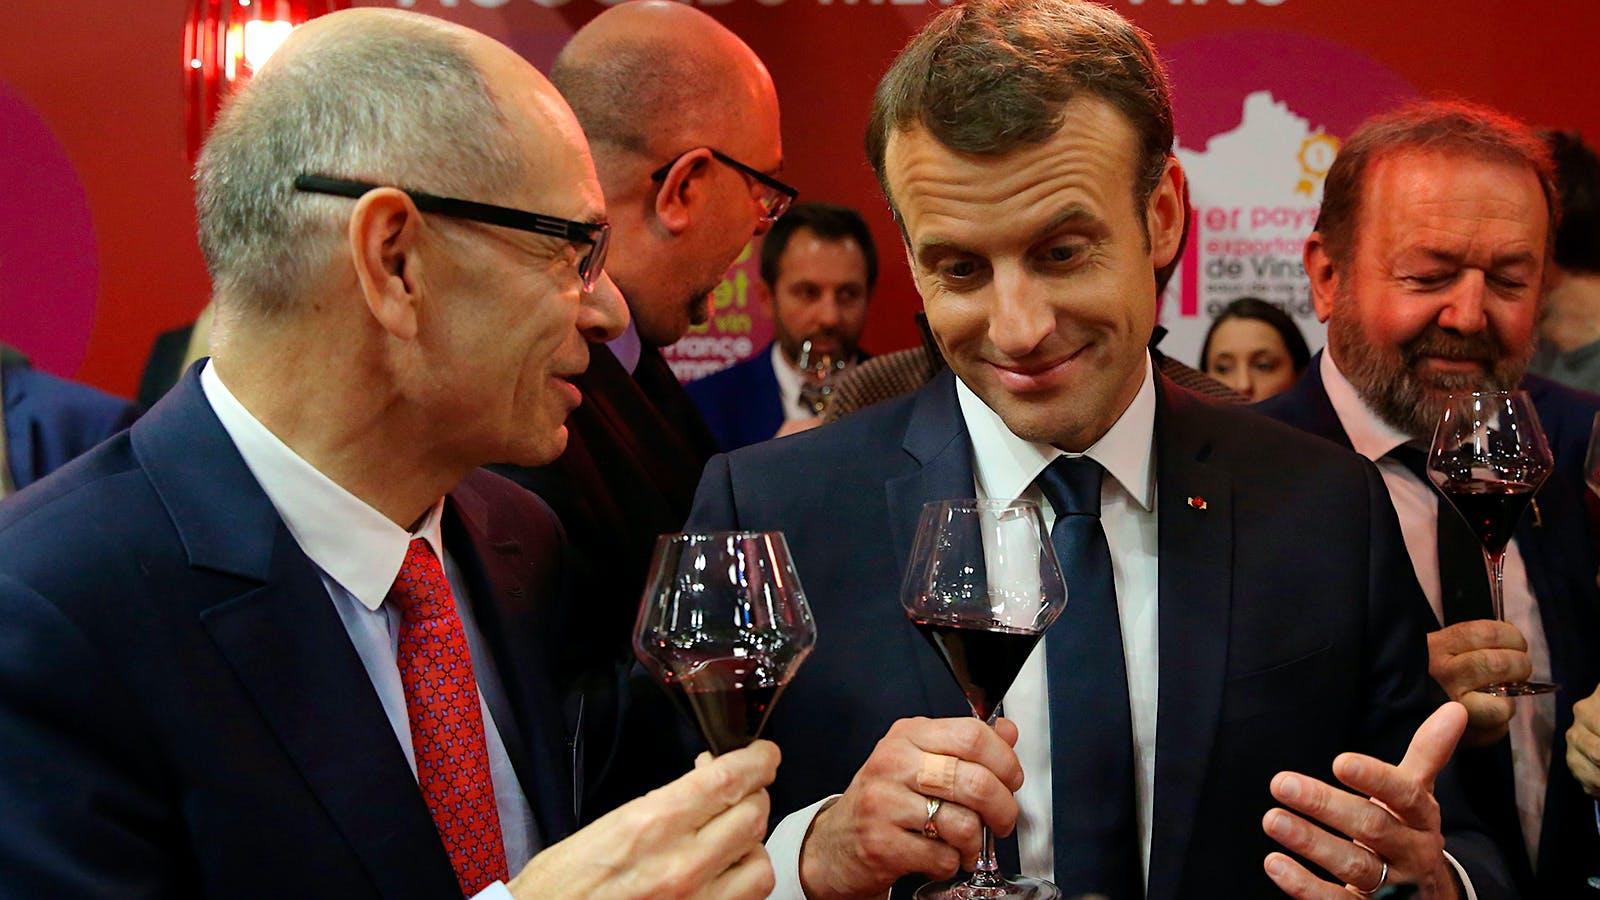 Emmanuel Macron Declares Wine O'Clock for Lunch and Dinner, Snaps Winemaker Selfies